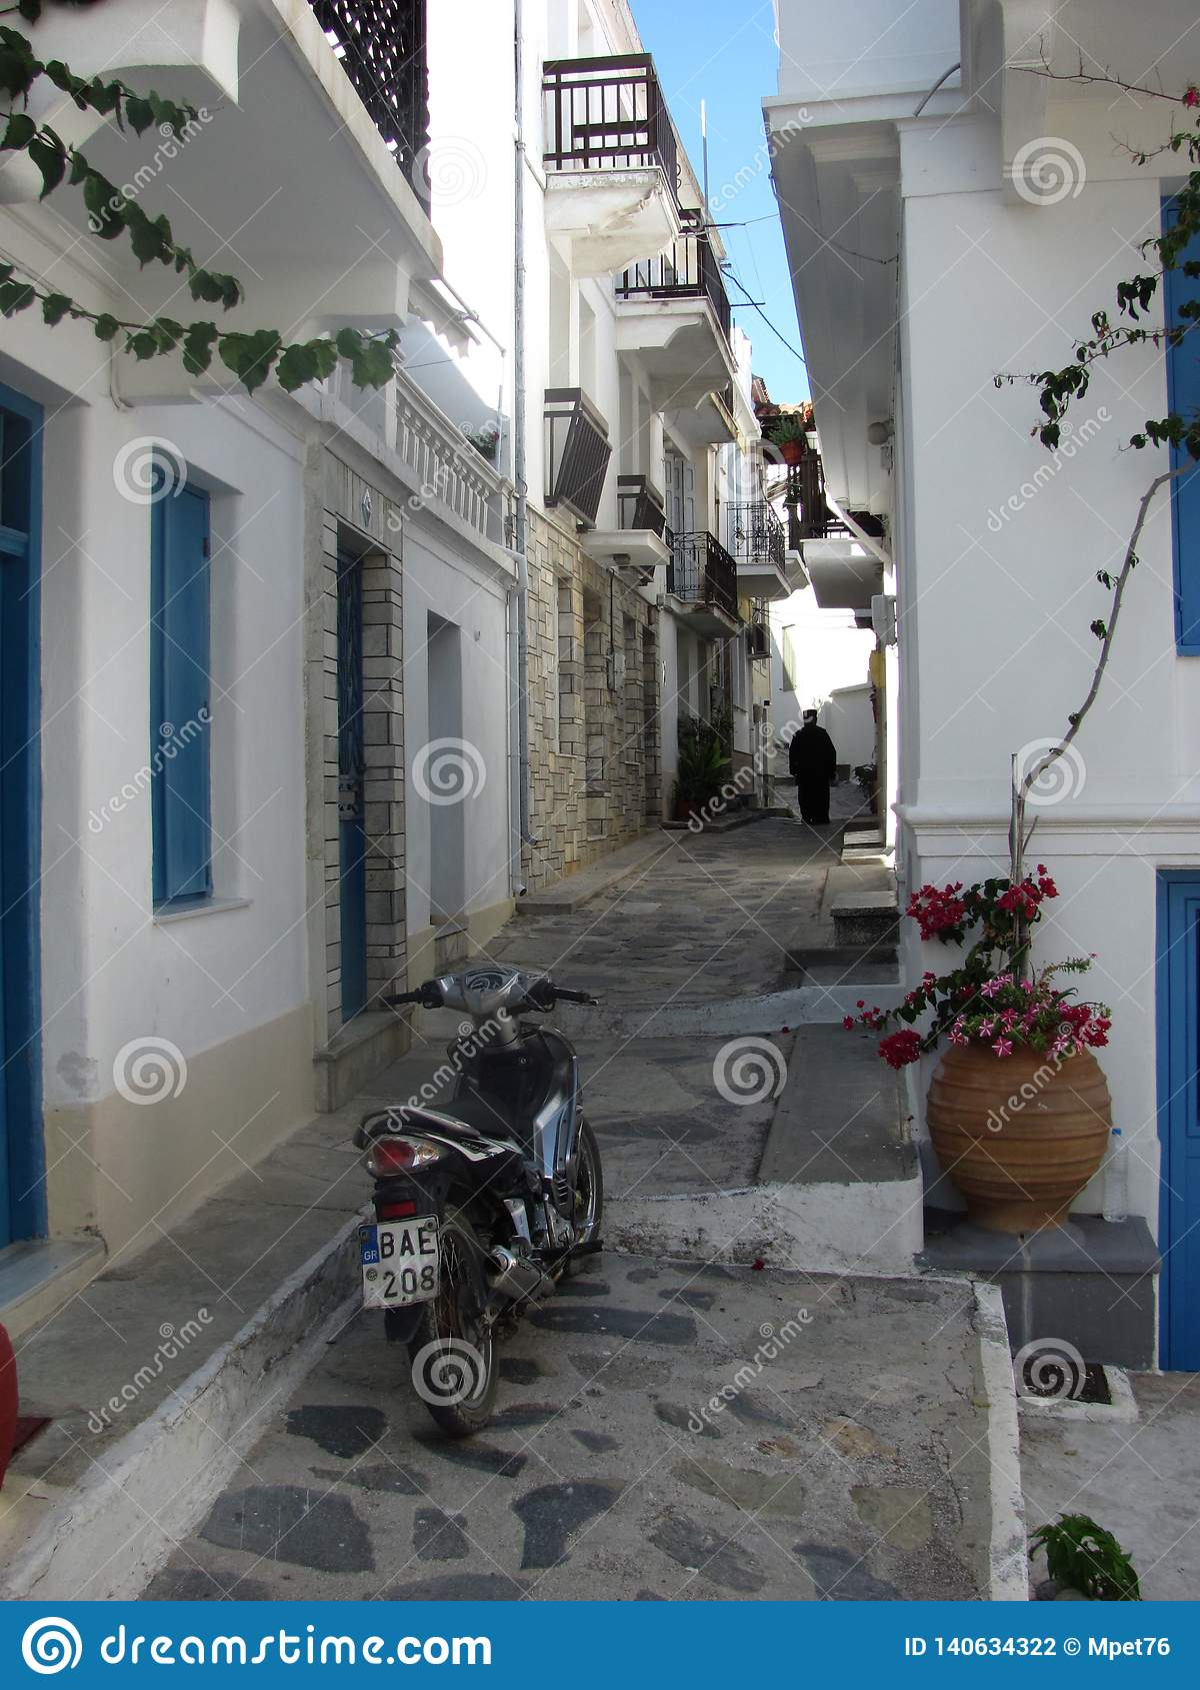 Eilandskopelos in Griekenland